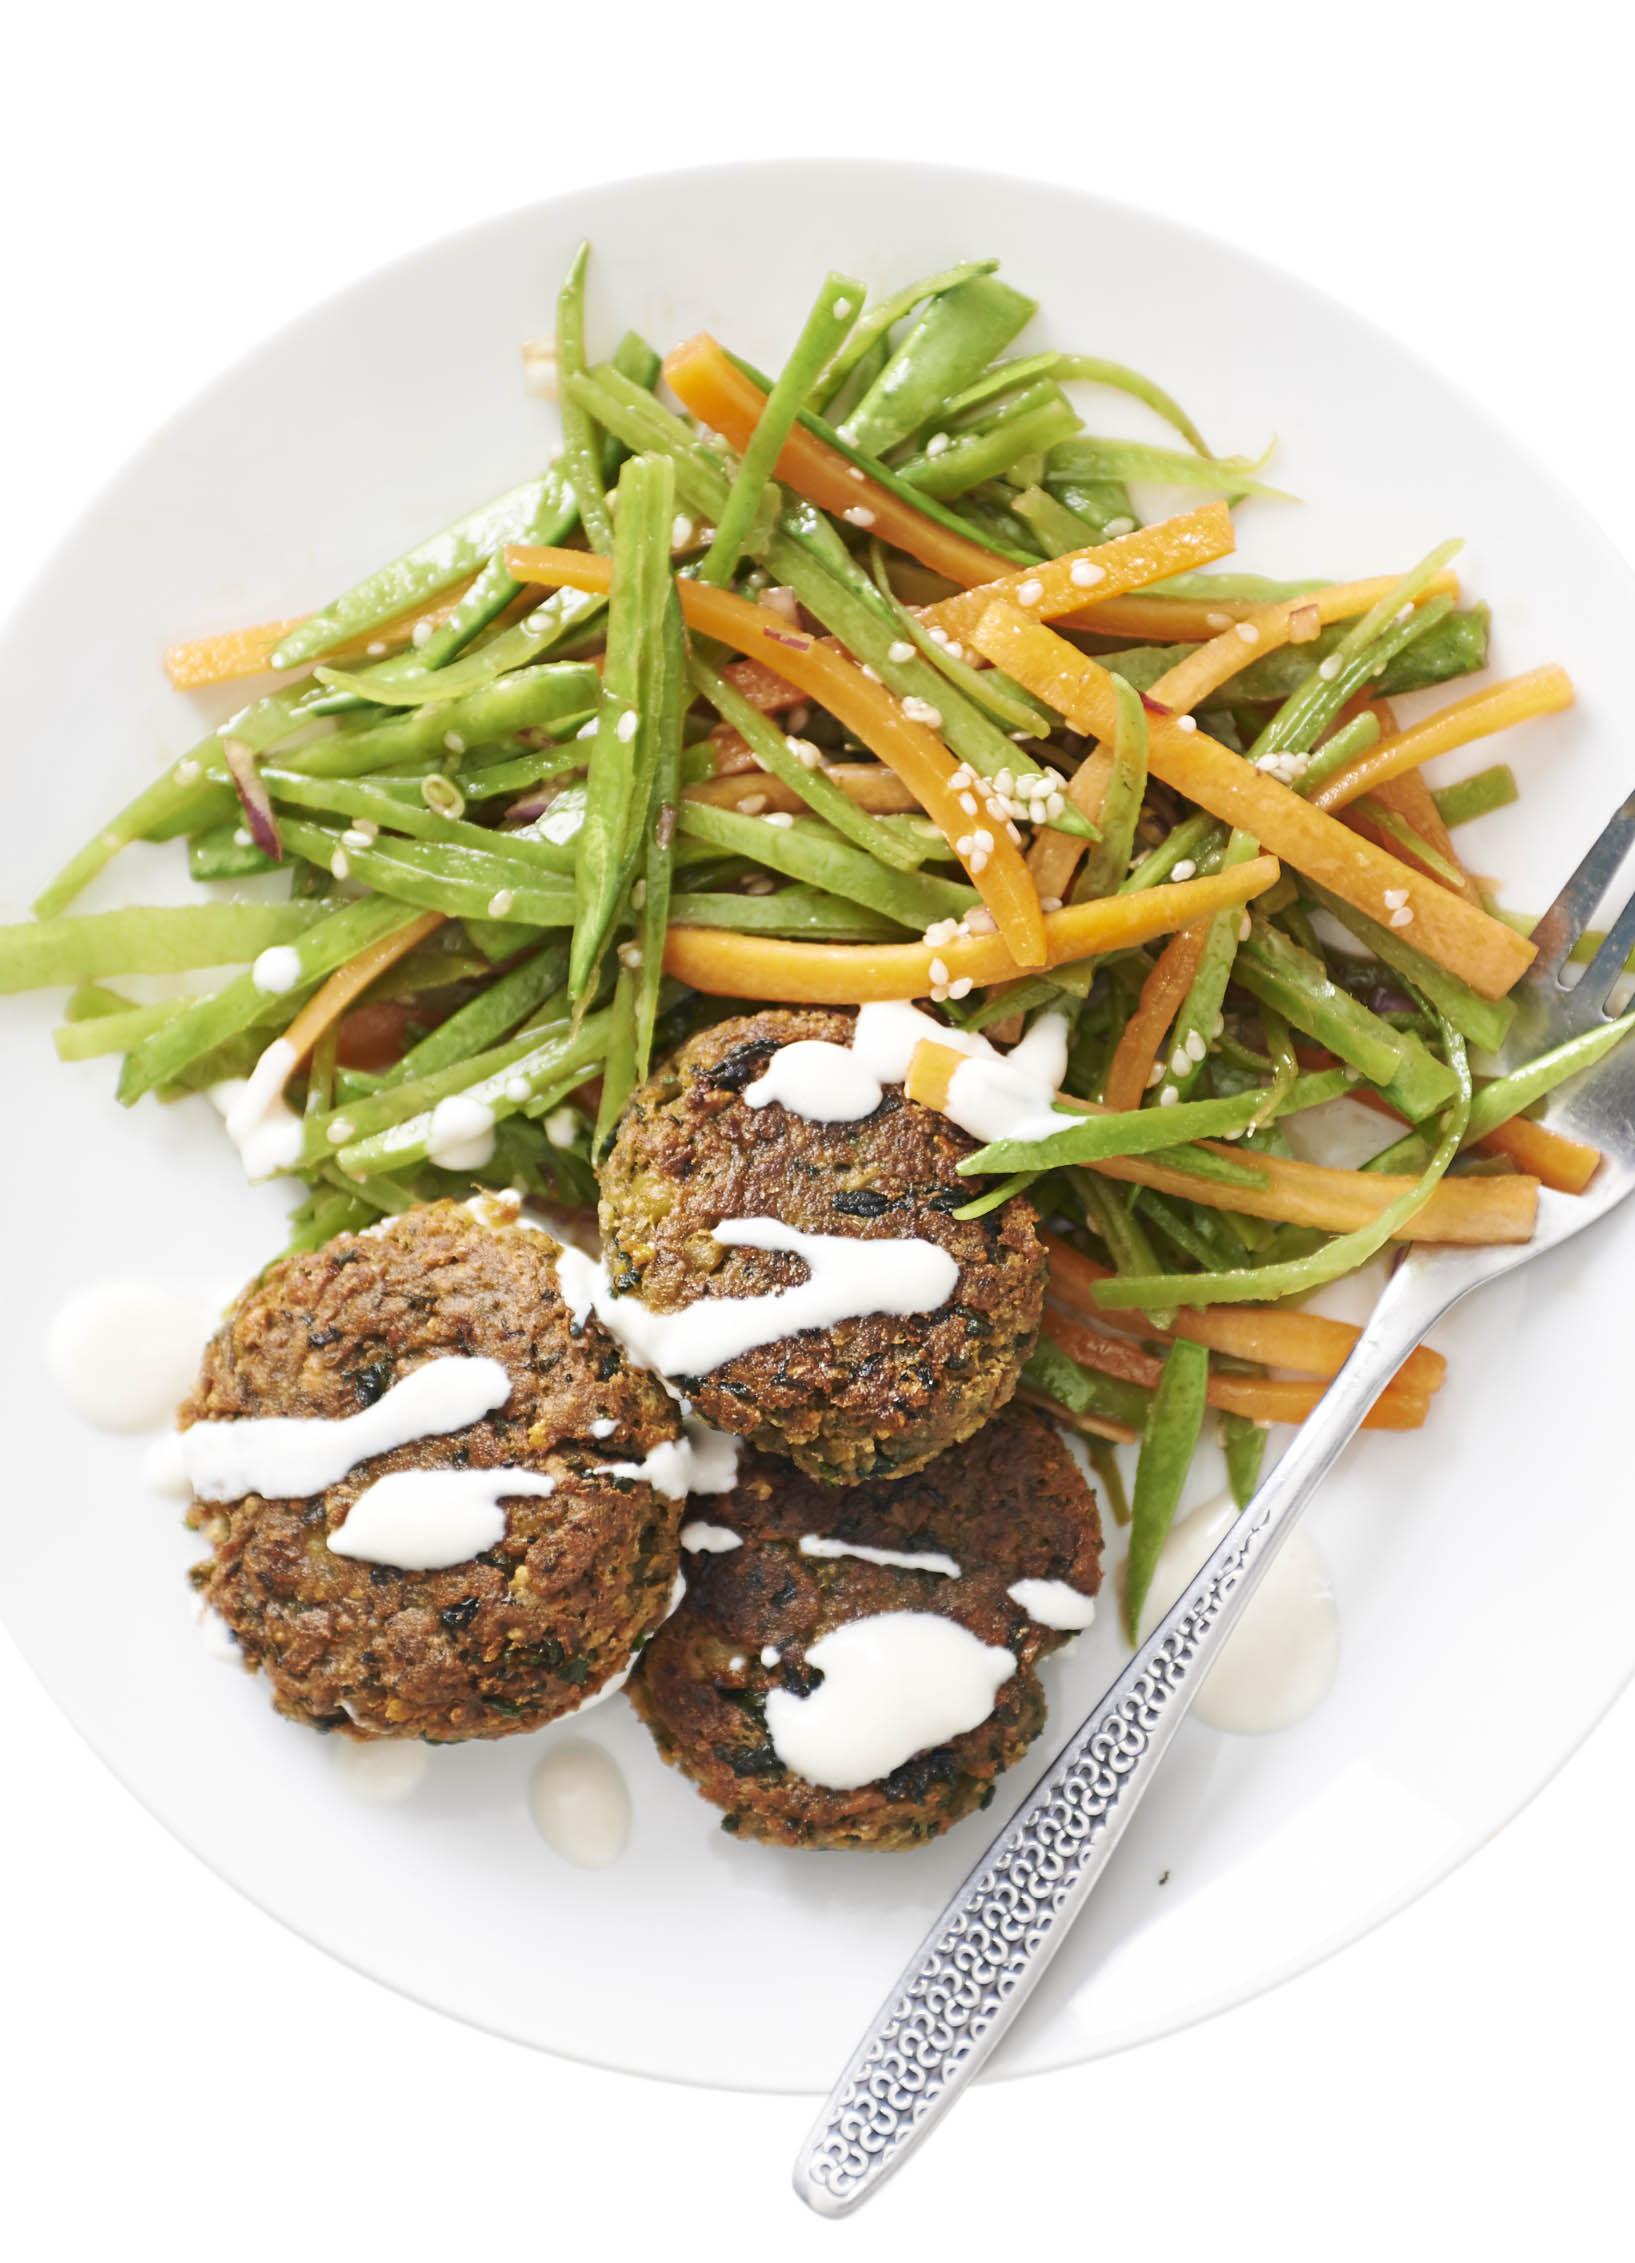 Spinach Falafel With Sesame Mangetout Salad